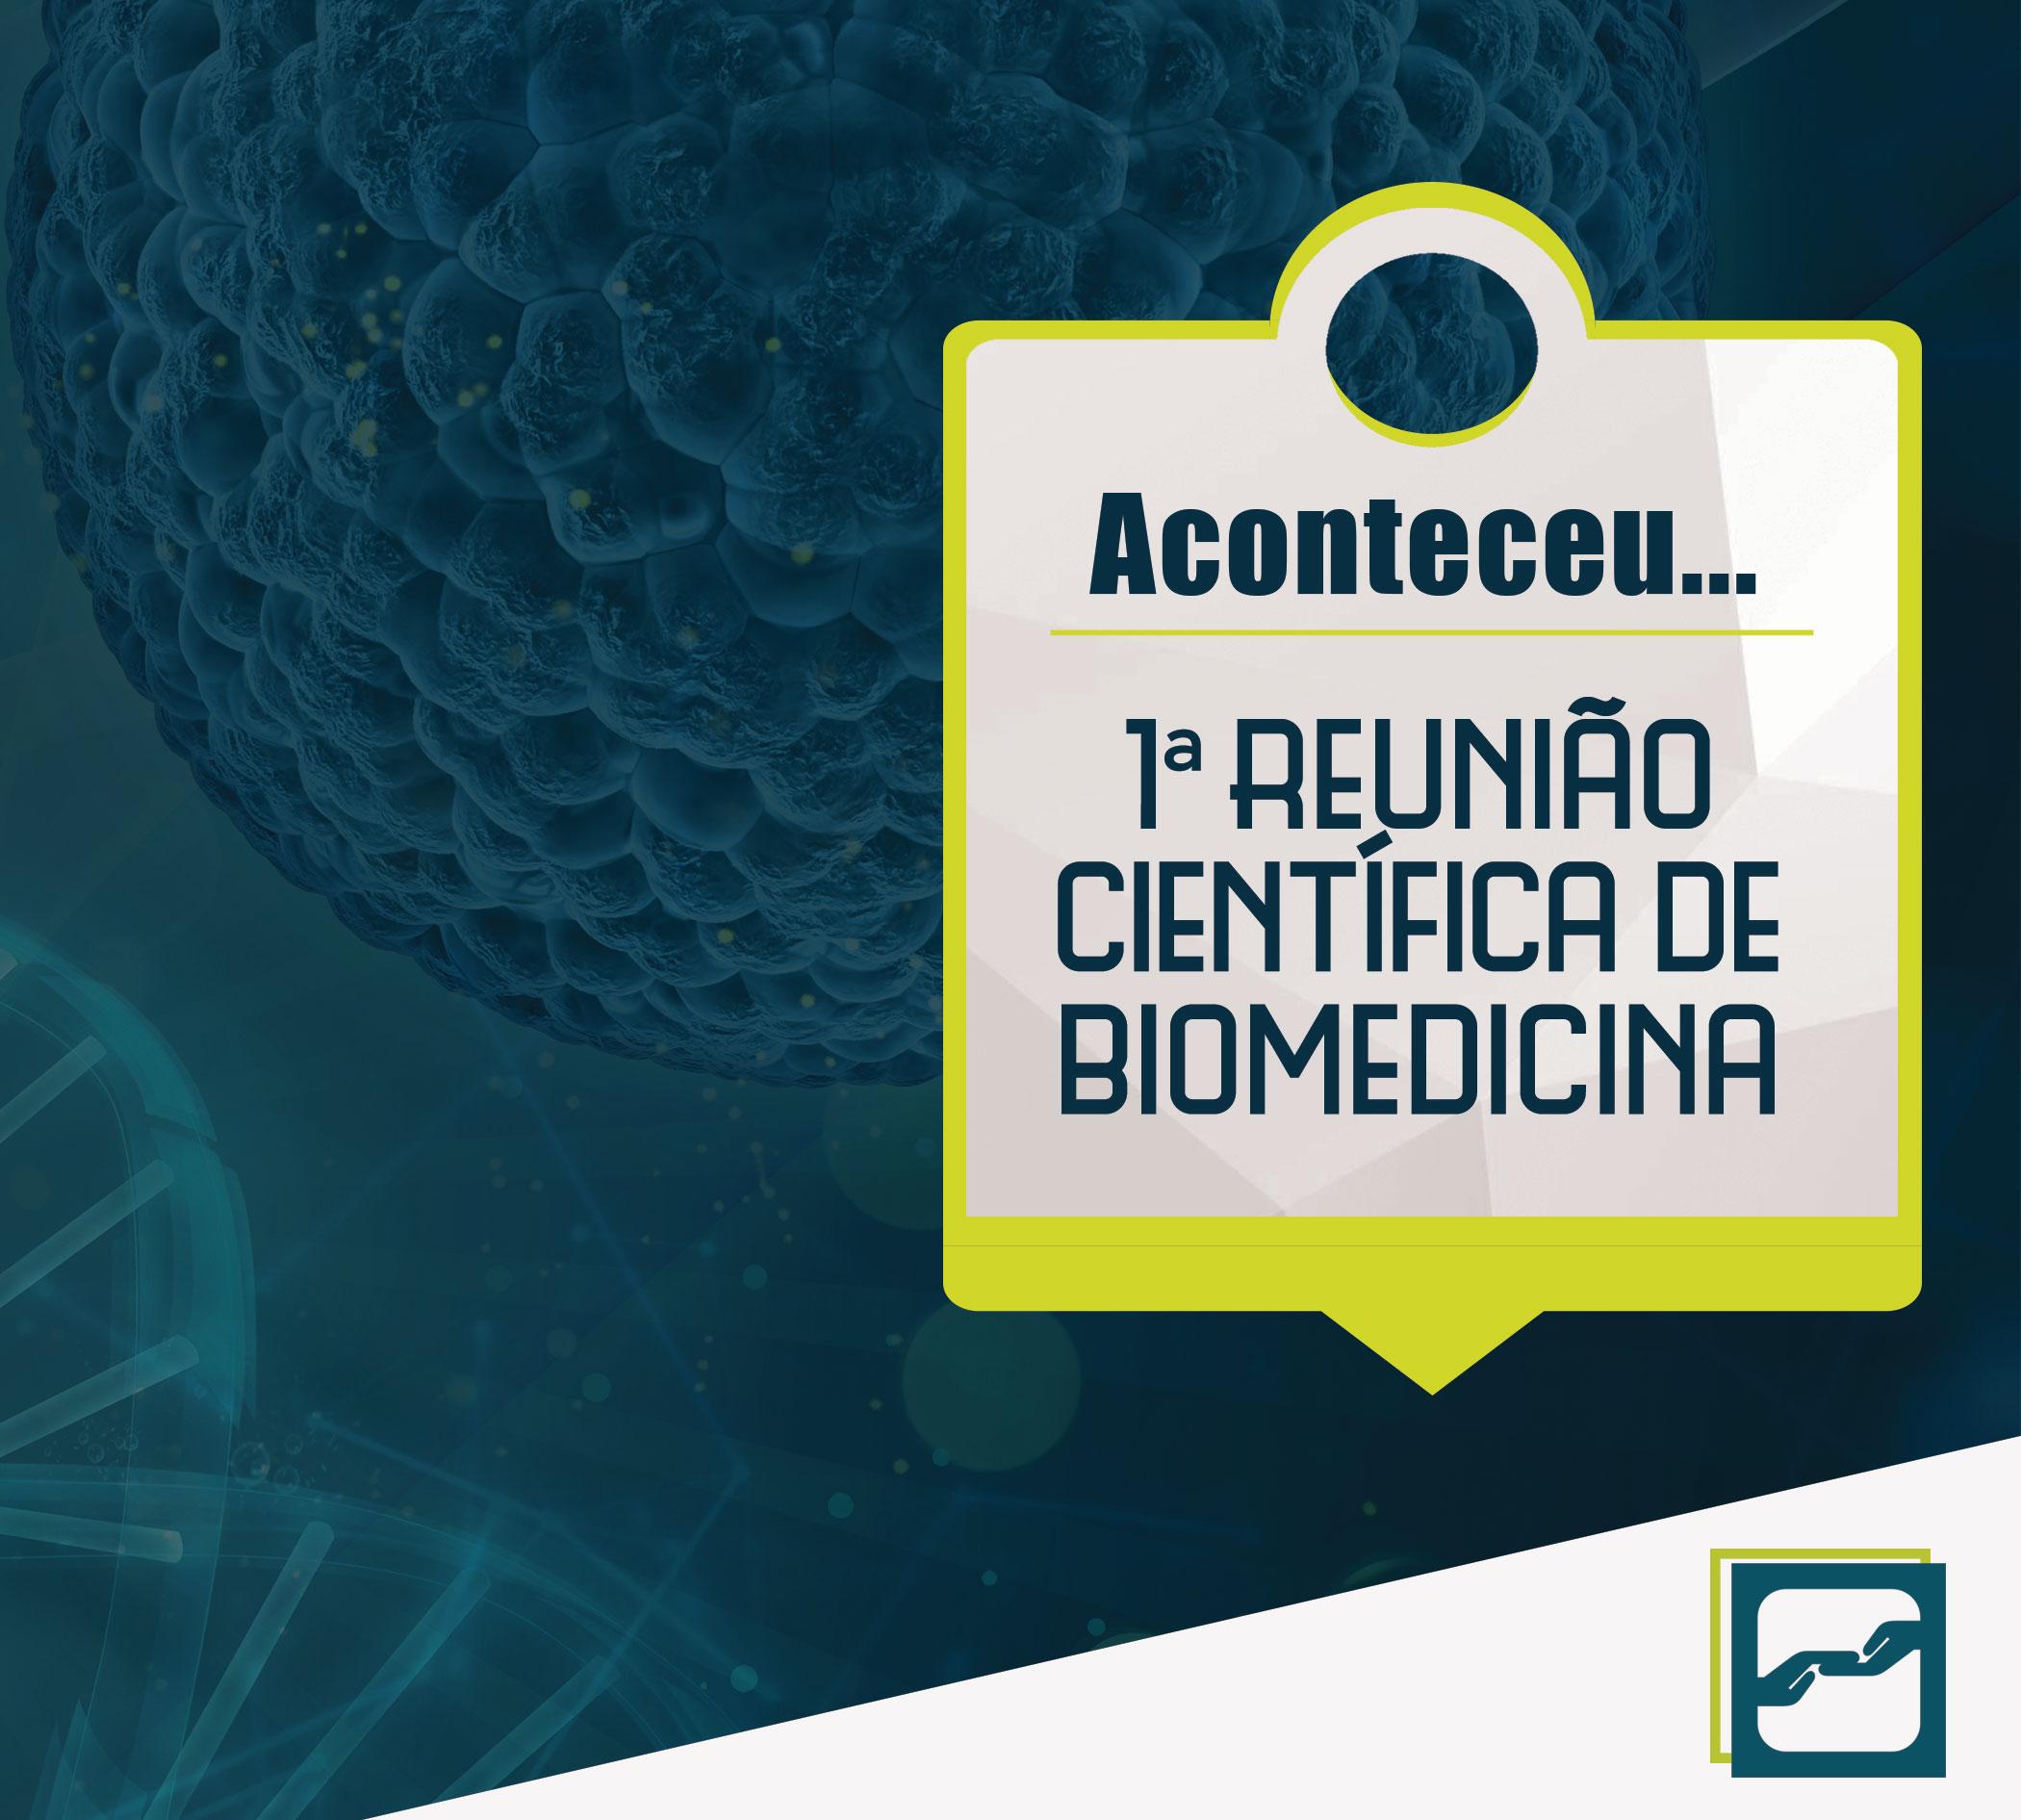 reuniao_cientifica_biomedicina